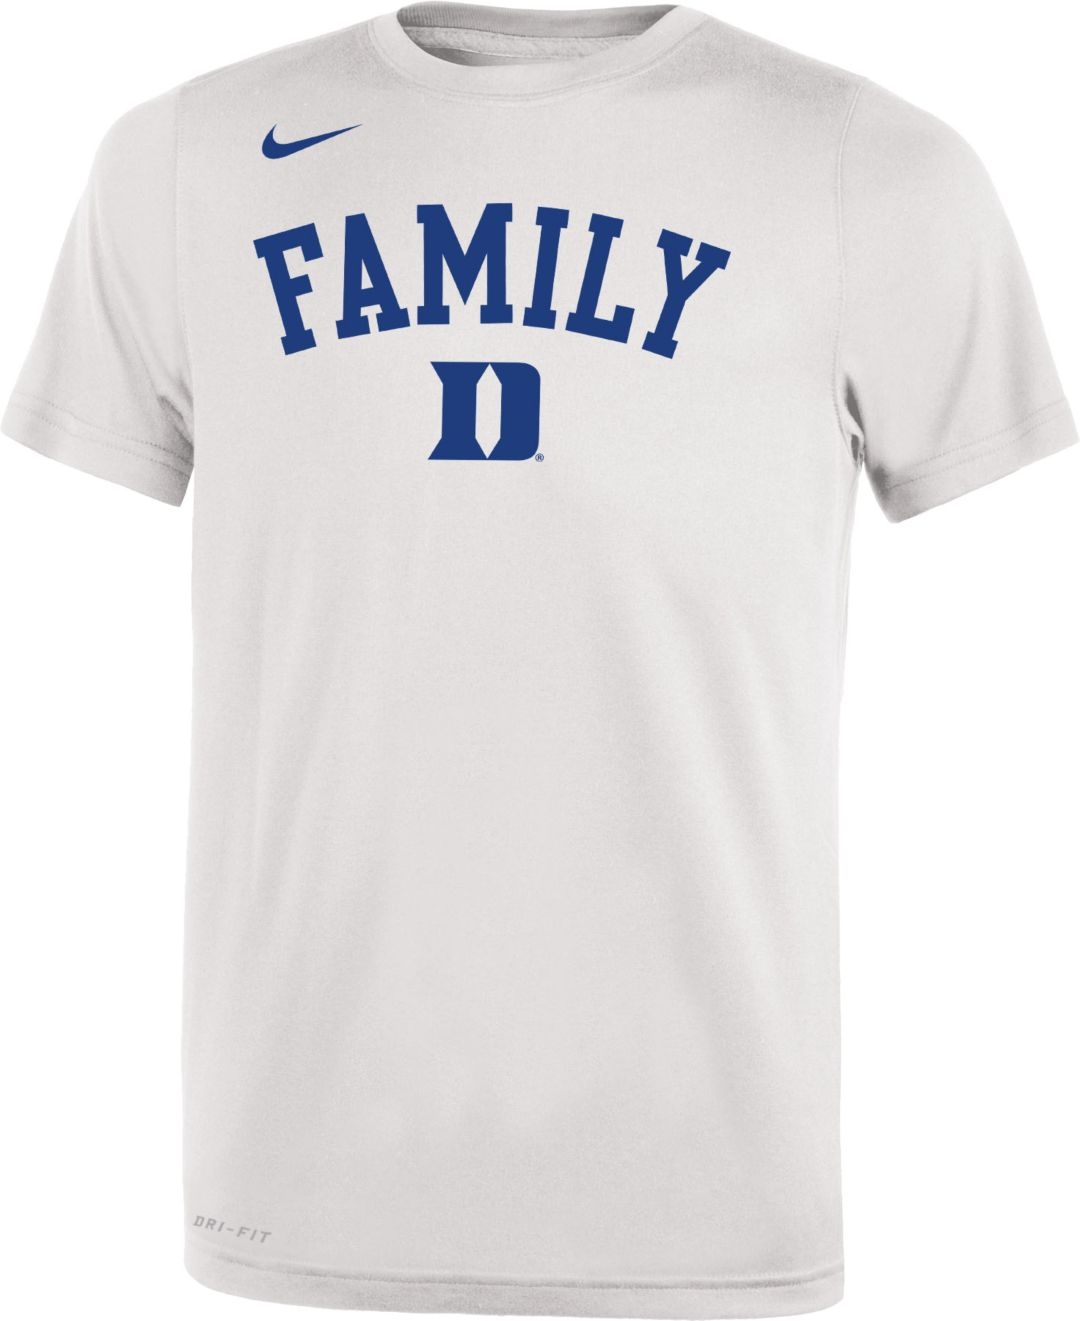 meet 5c86b ce52c Nike Youth Duke Blue Devils 'Family' Bench White T-Shirt